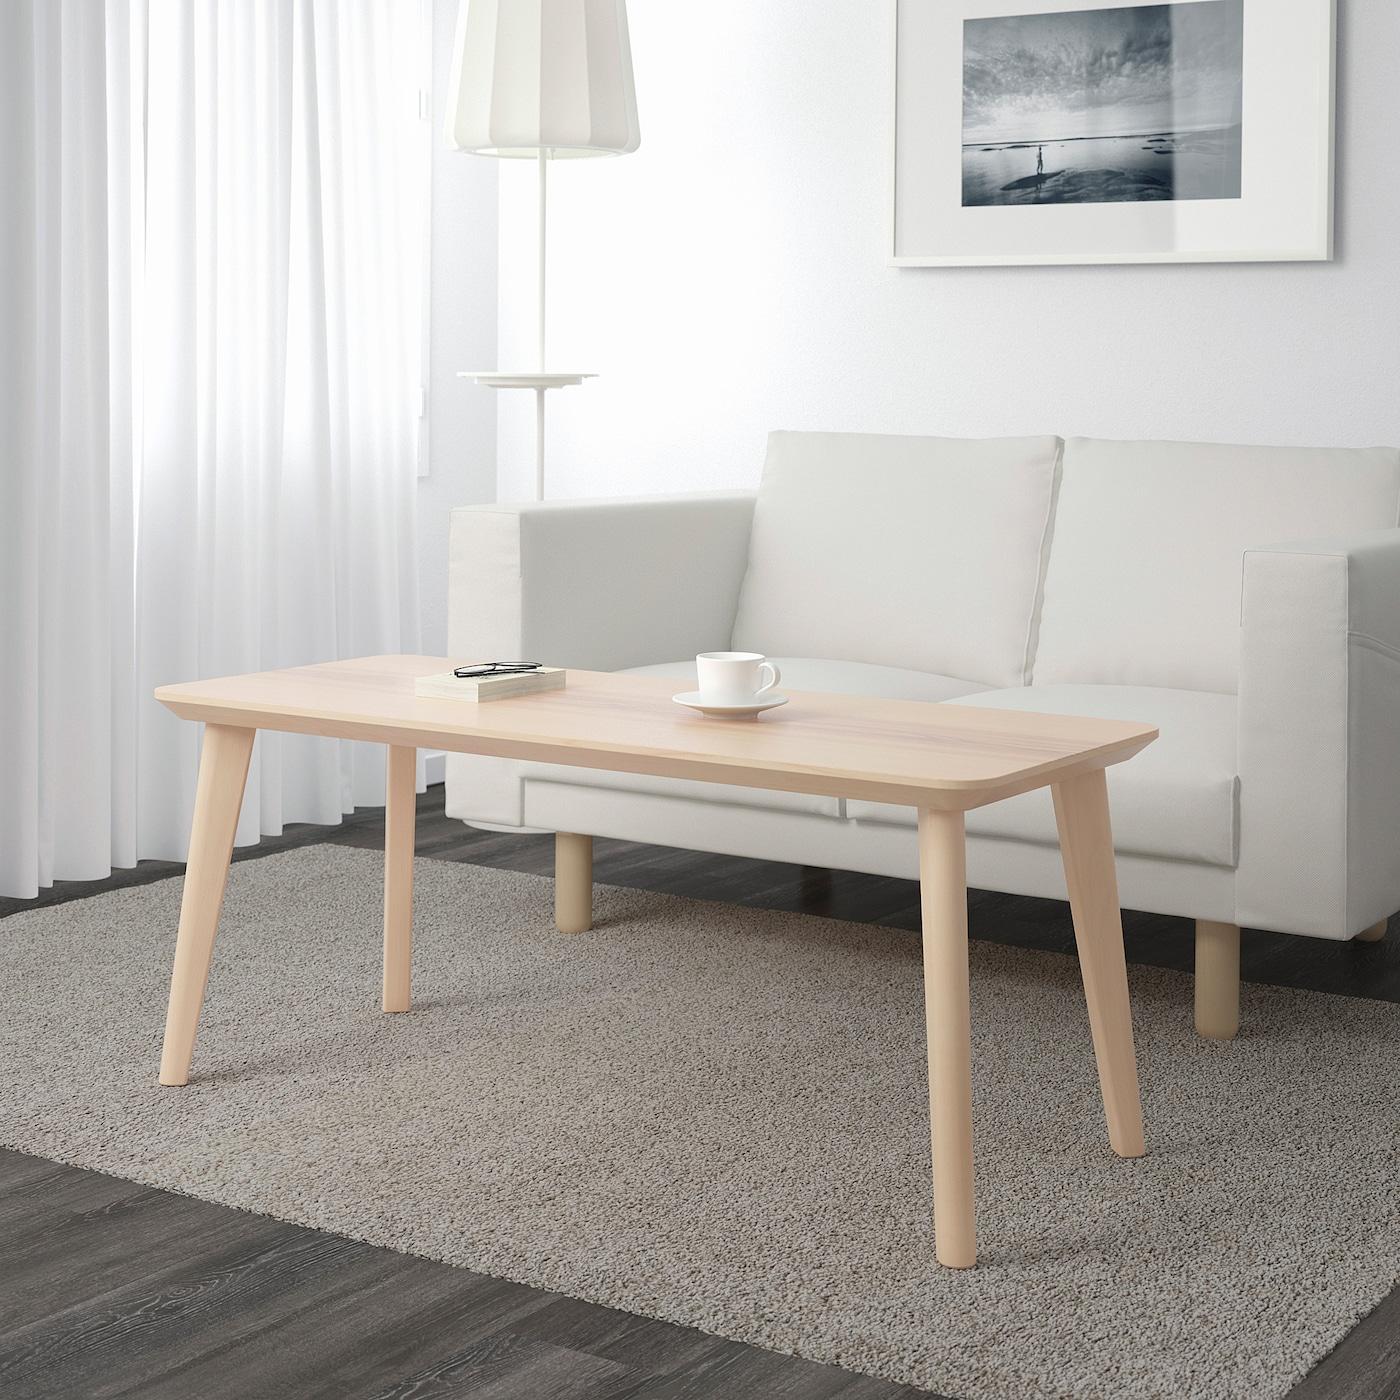 Inside Design Salontafel.Lisabo Coffee Table Ash Veneer 46 1 2x19 5 8 Ikea